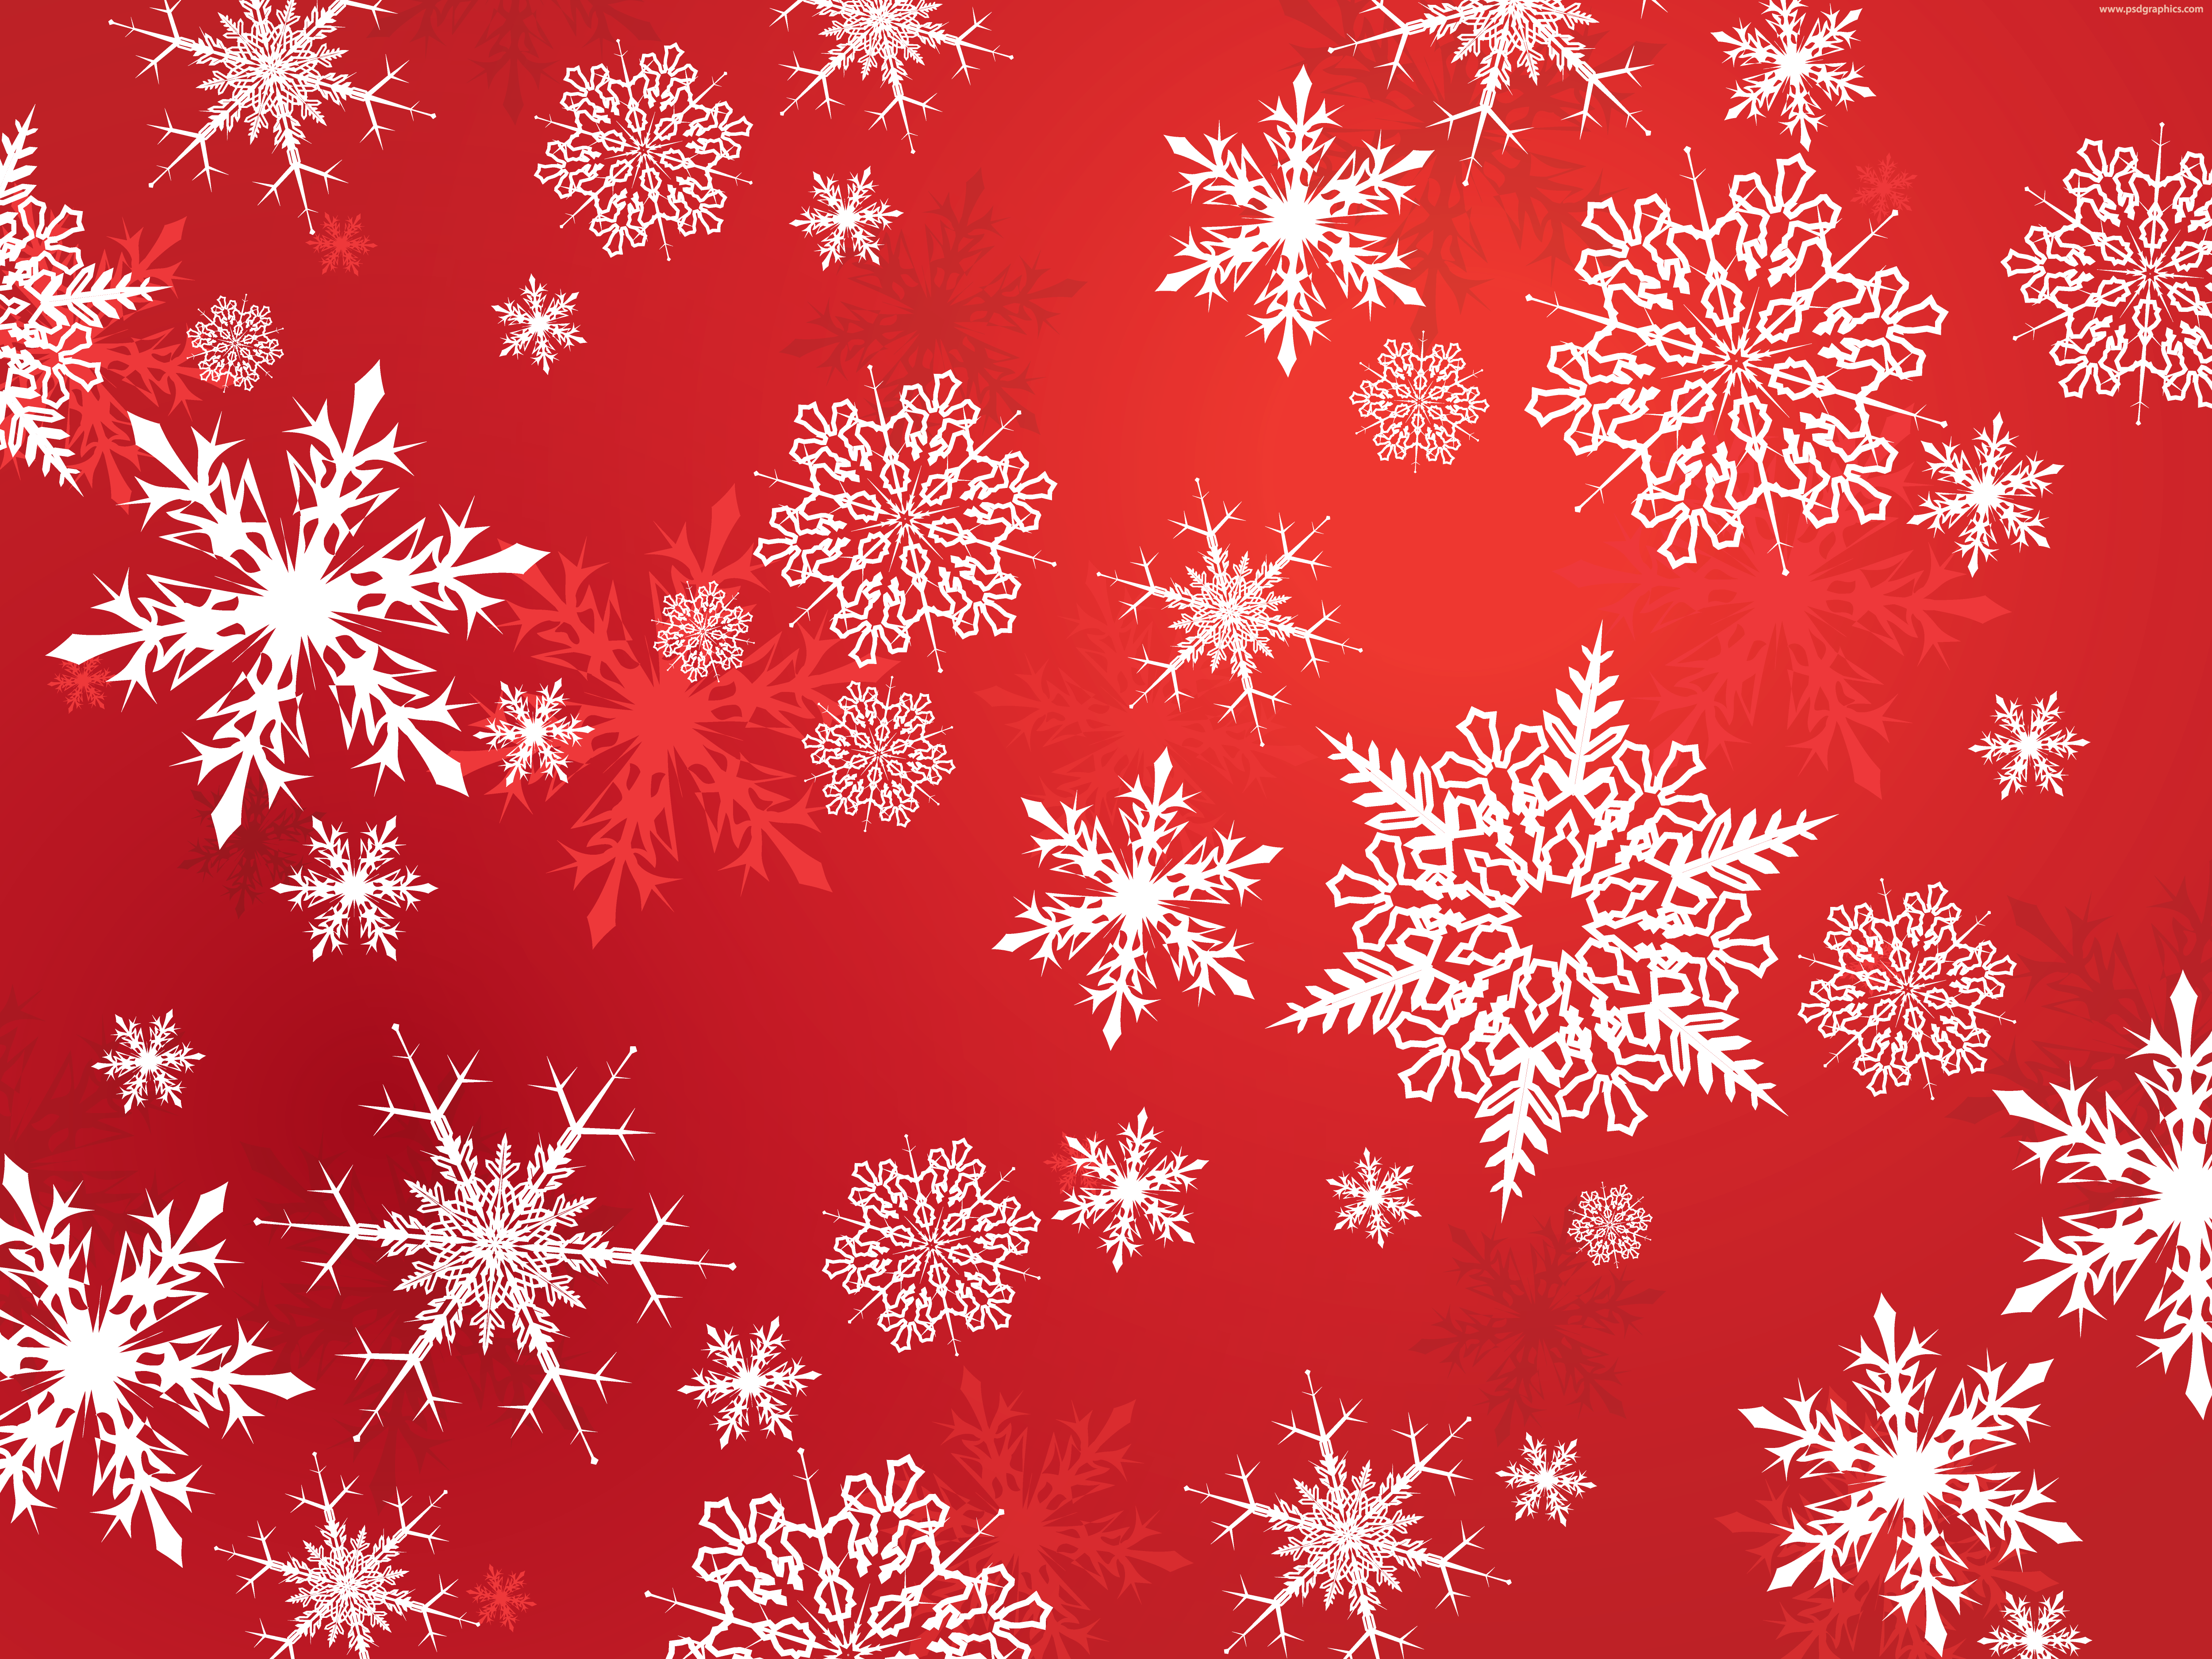 Vector snowflakes background PSDGraphics Snowflake